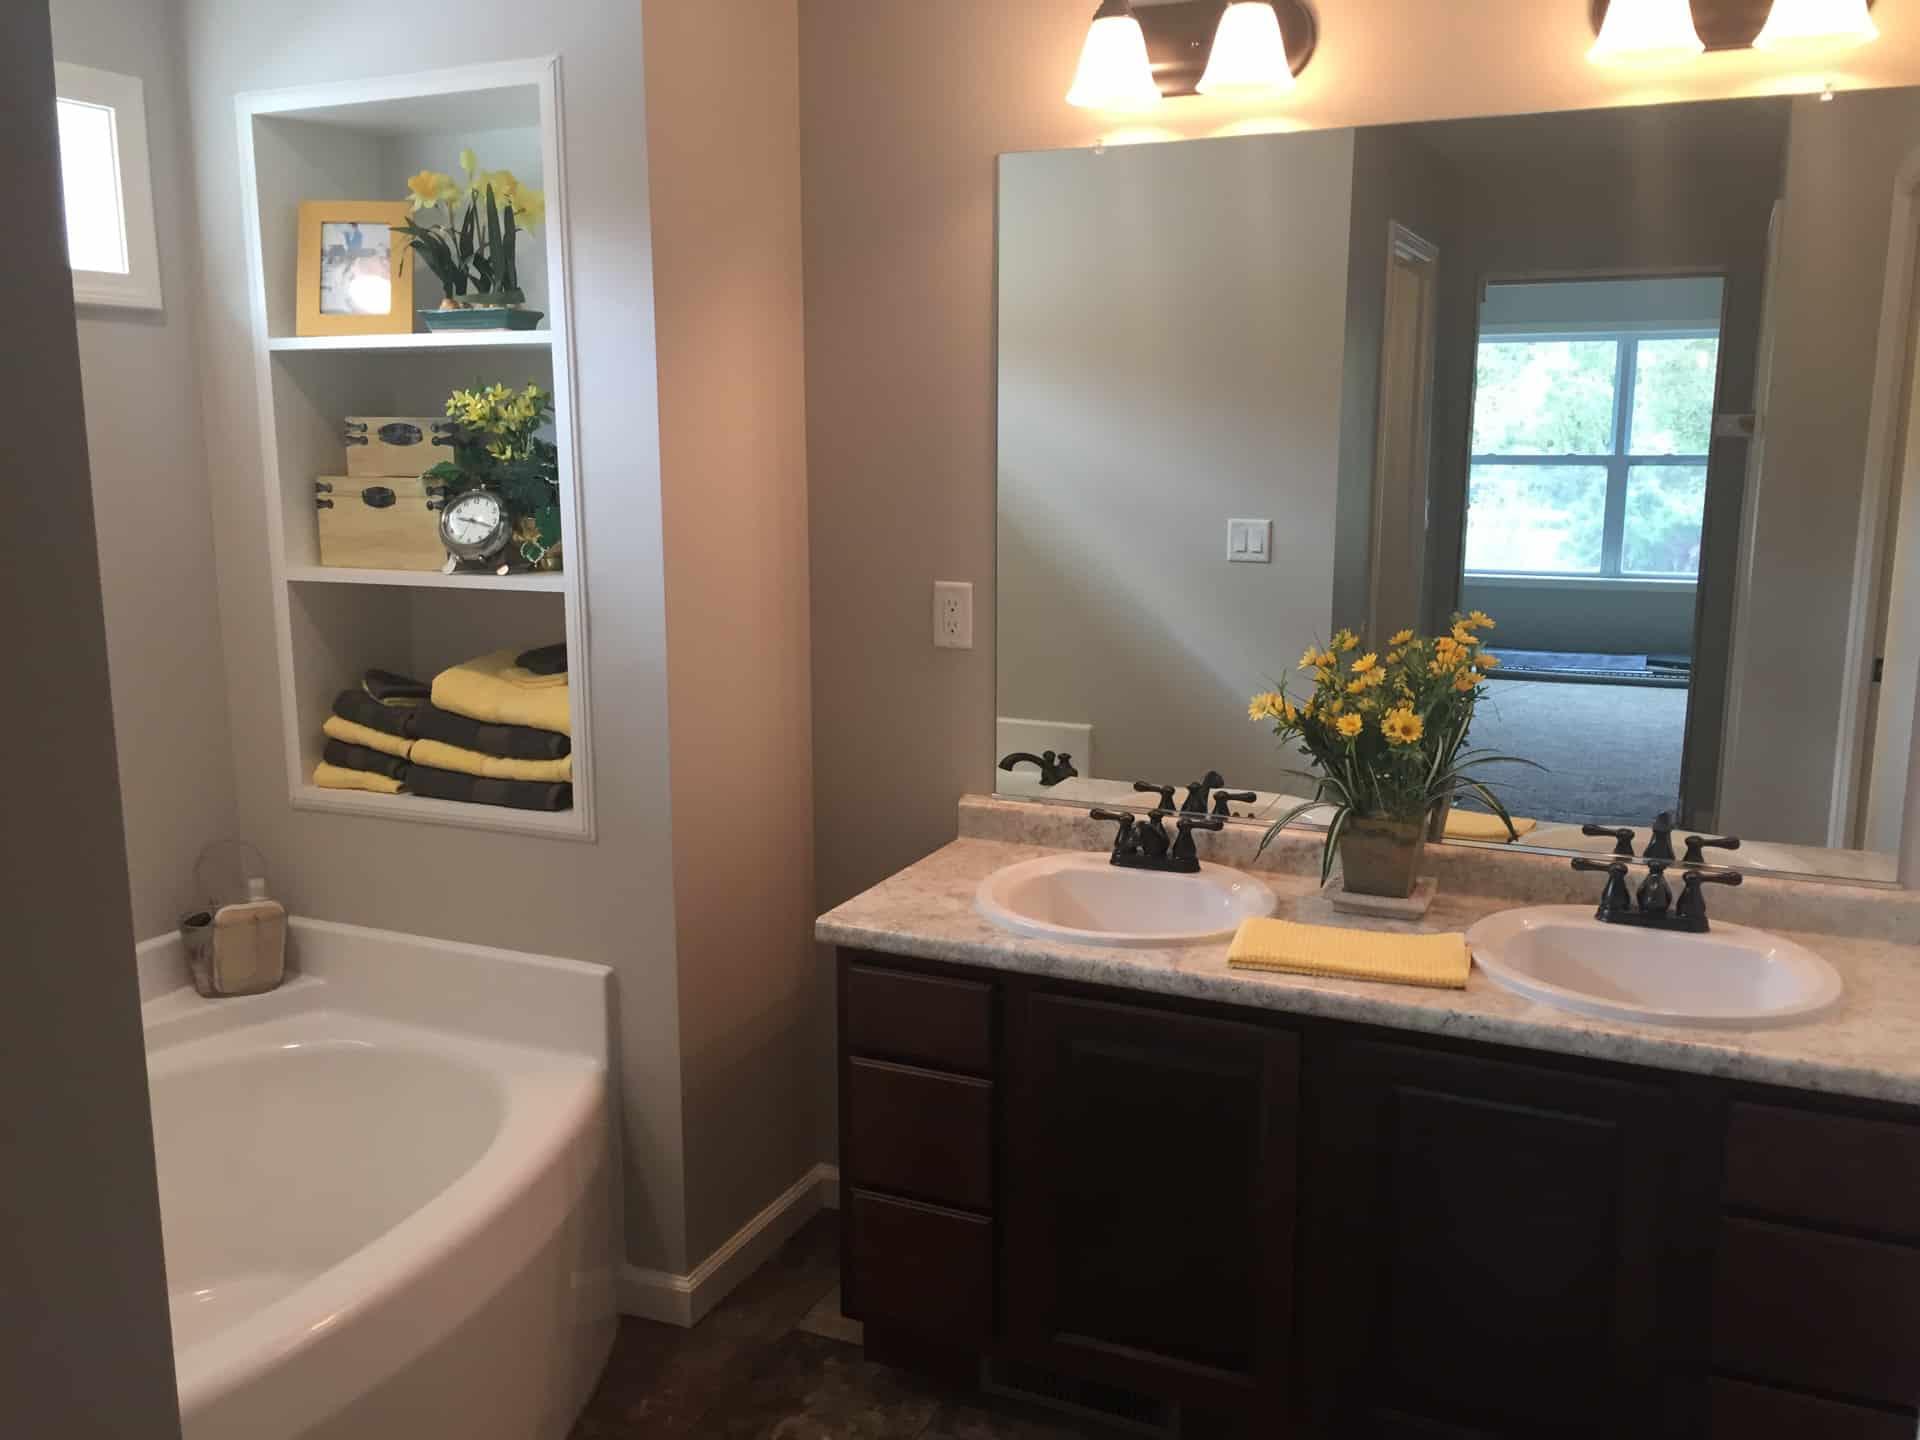 Unibilt Kenwood Chillicothe Bathroom (2)